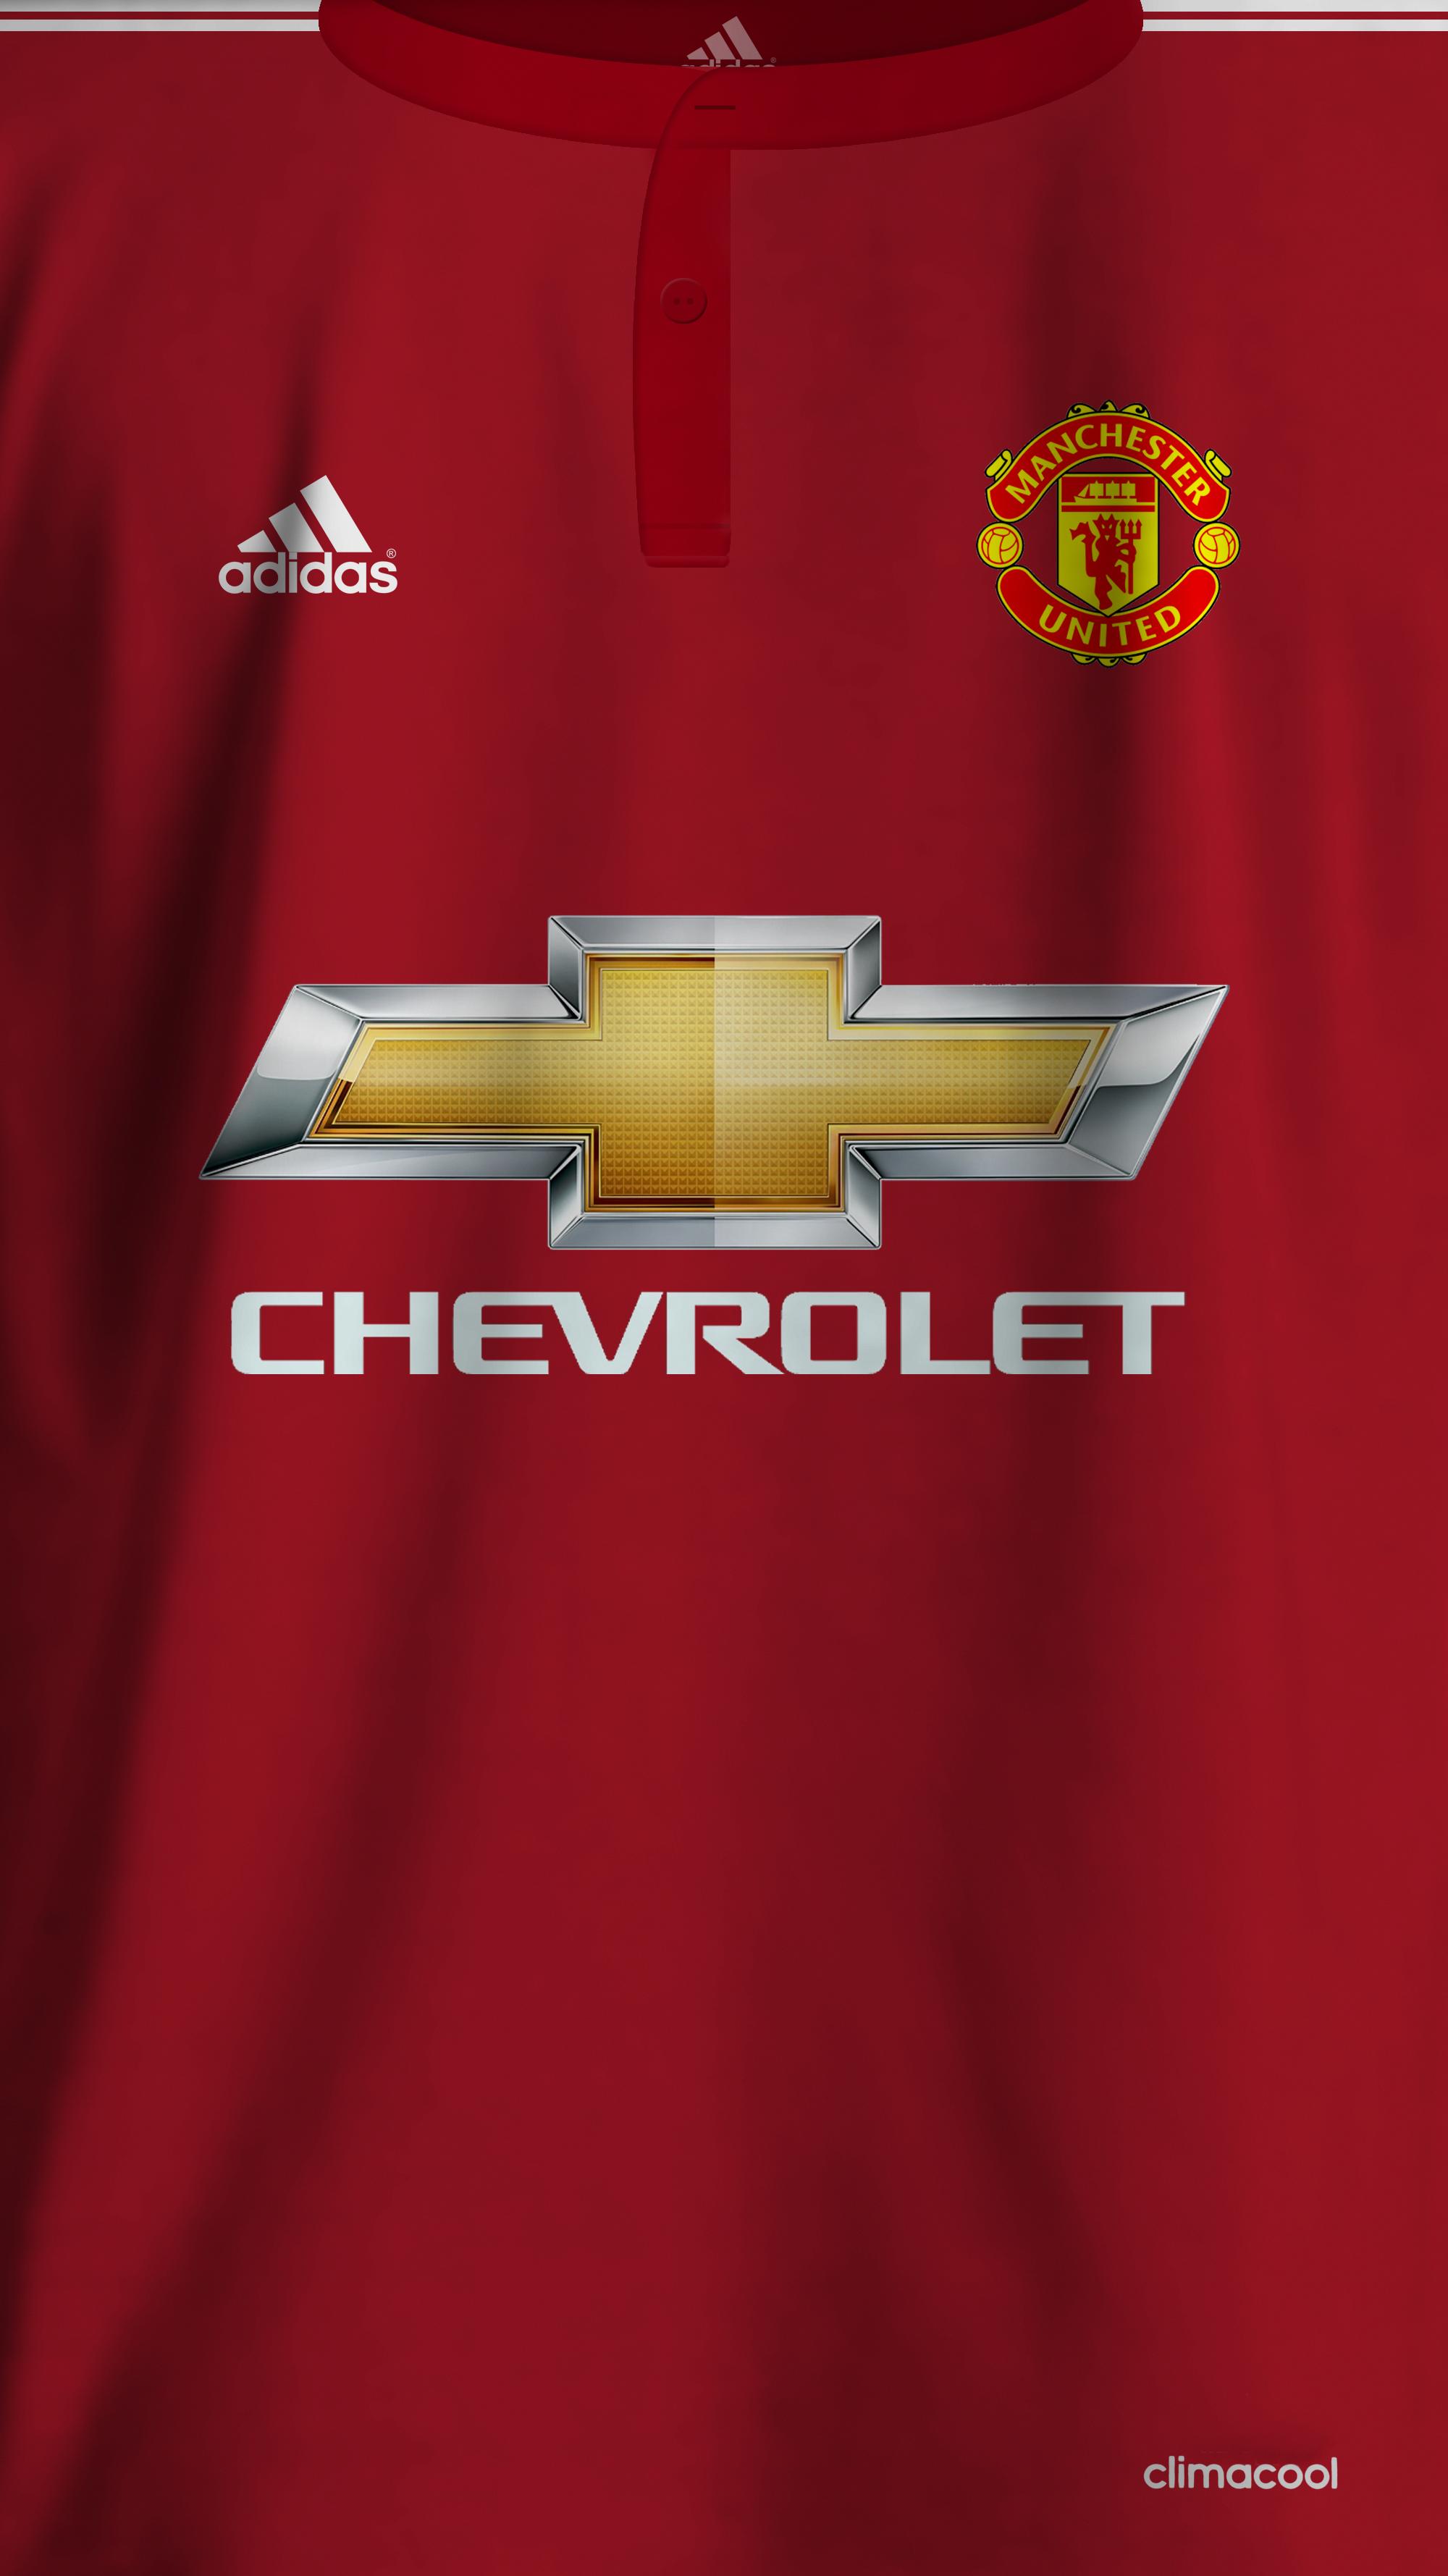 Soccertips Manchester United Wallpaper Manchester United Logo Manchester United Football